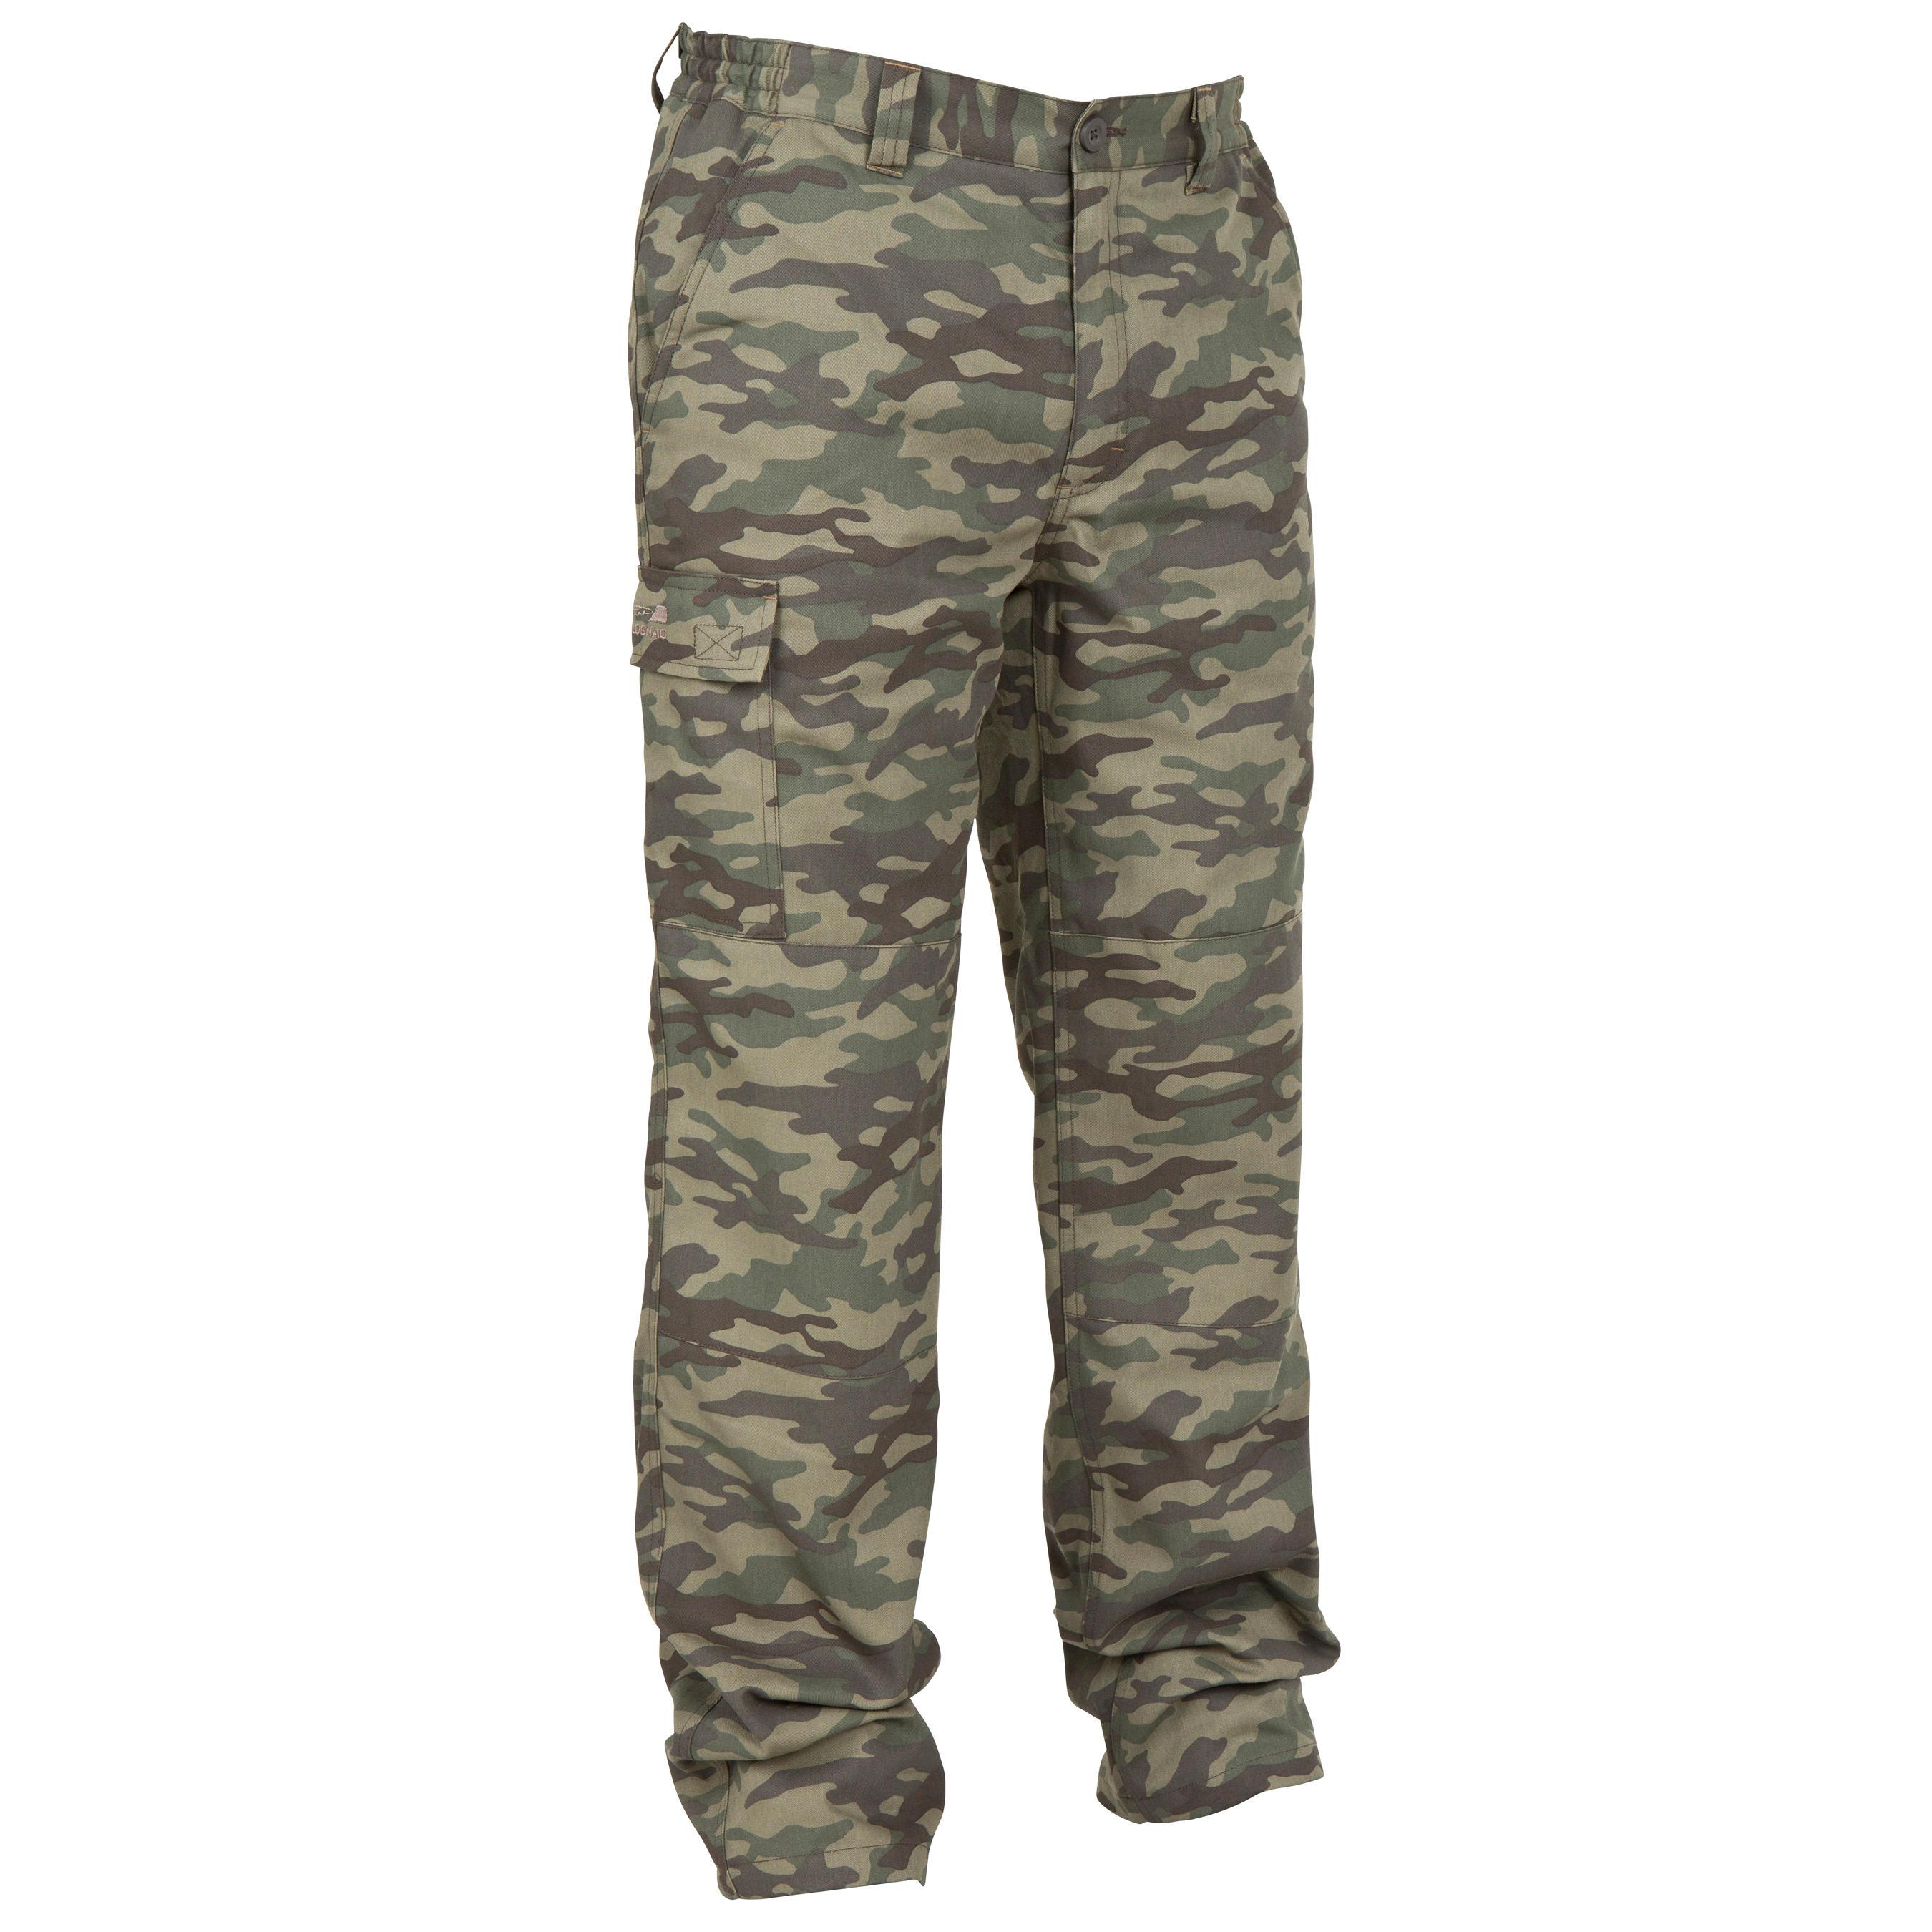 Herren Jagdhose 100 Camouflage | 03583788474760